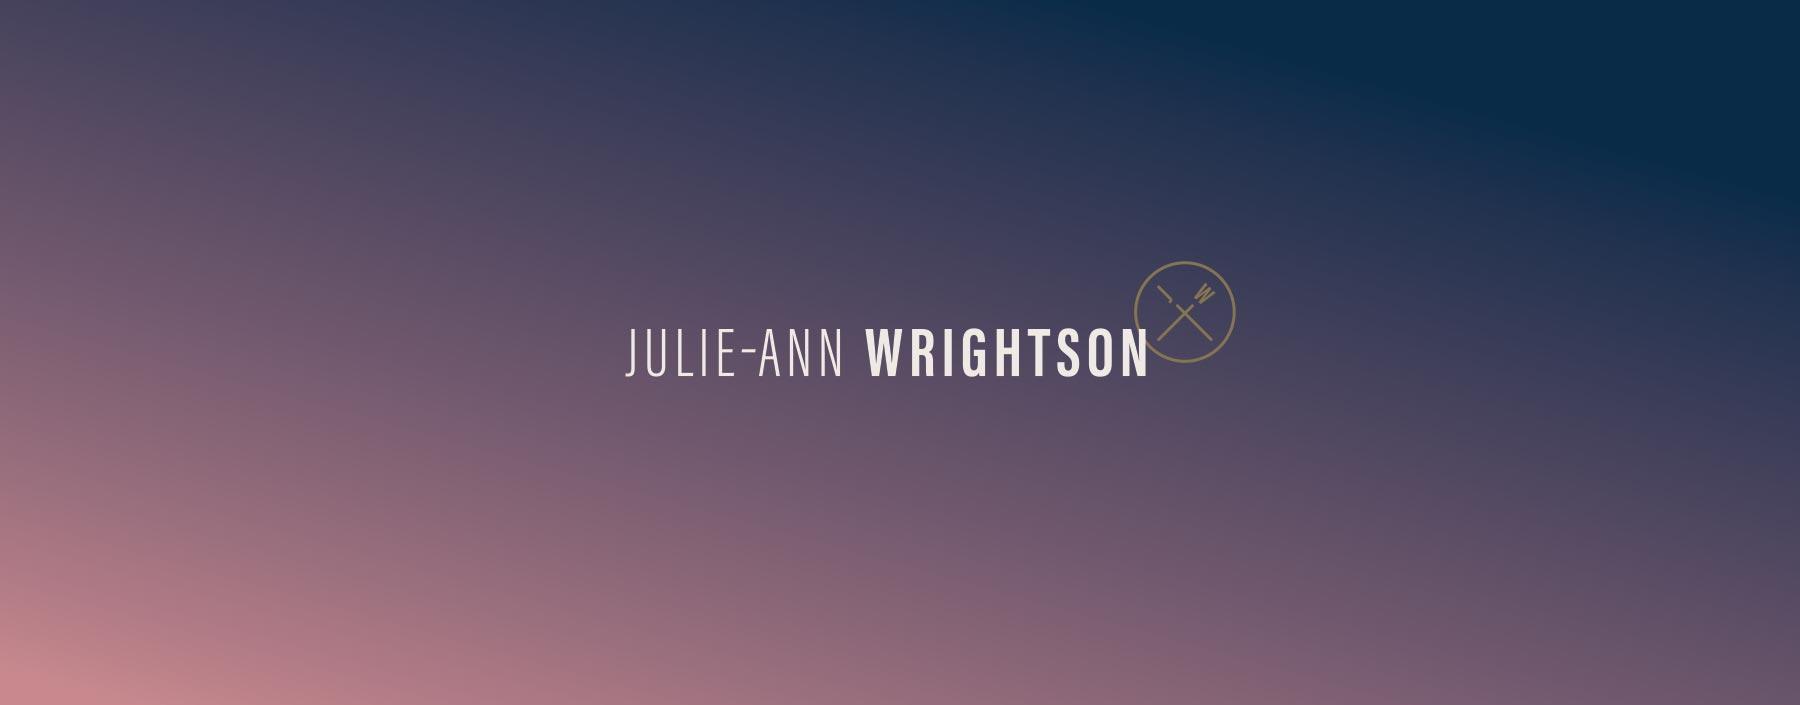 Julie-Ann Wrightson logo design